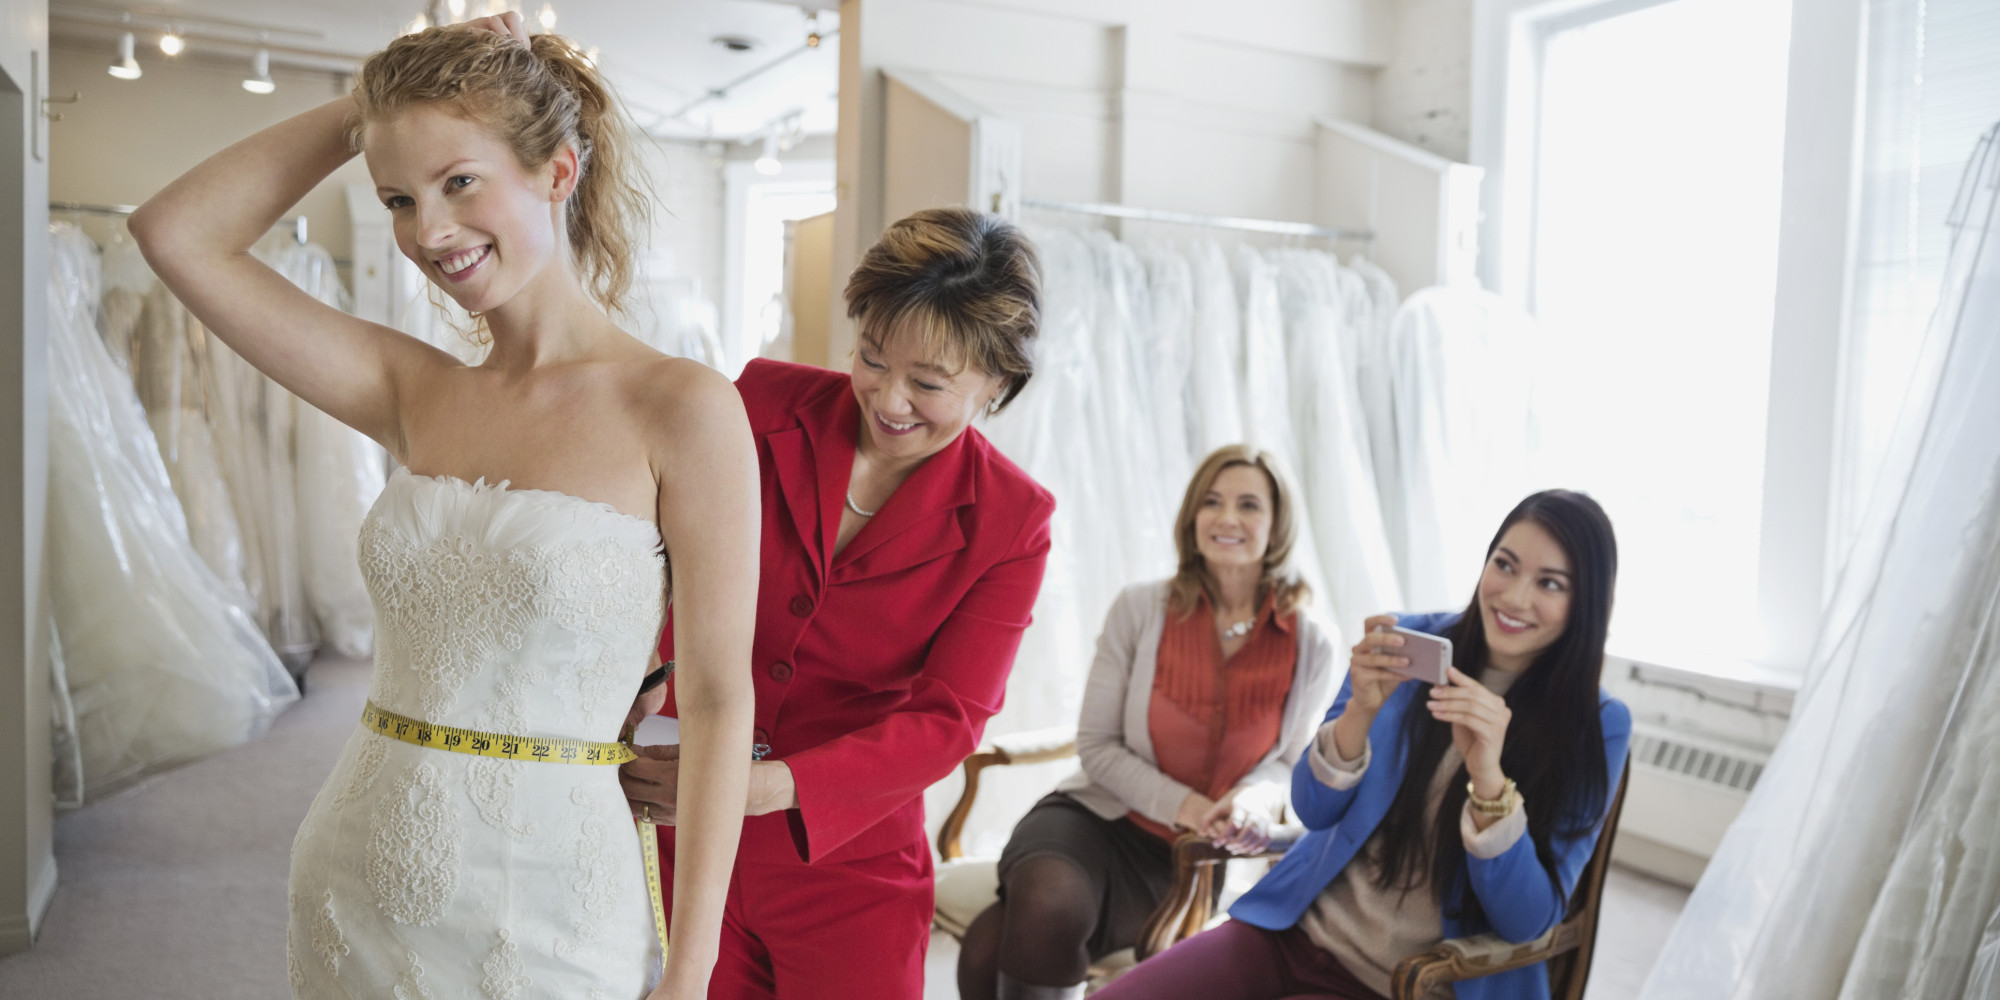 dress.. Wedding Dress Shops near Me: 10 Tips for Wedding Dress Shopping